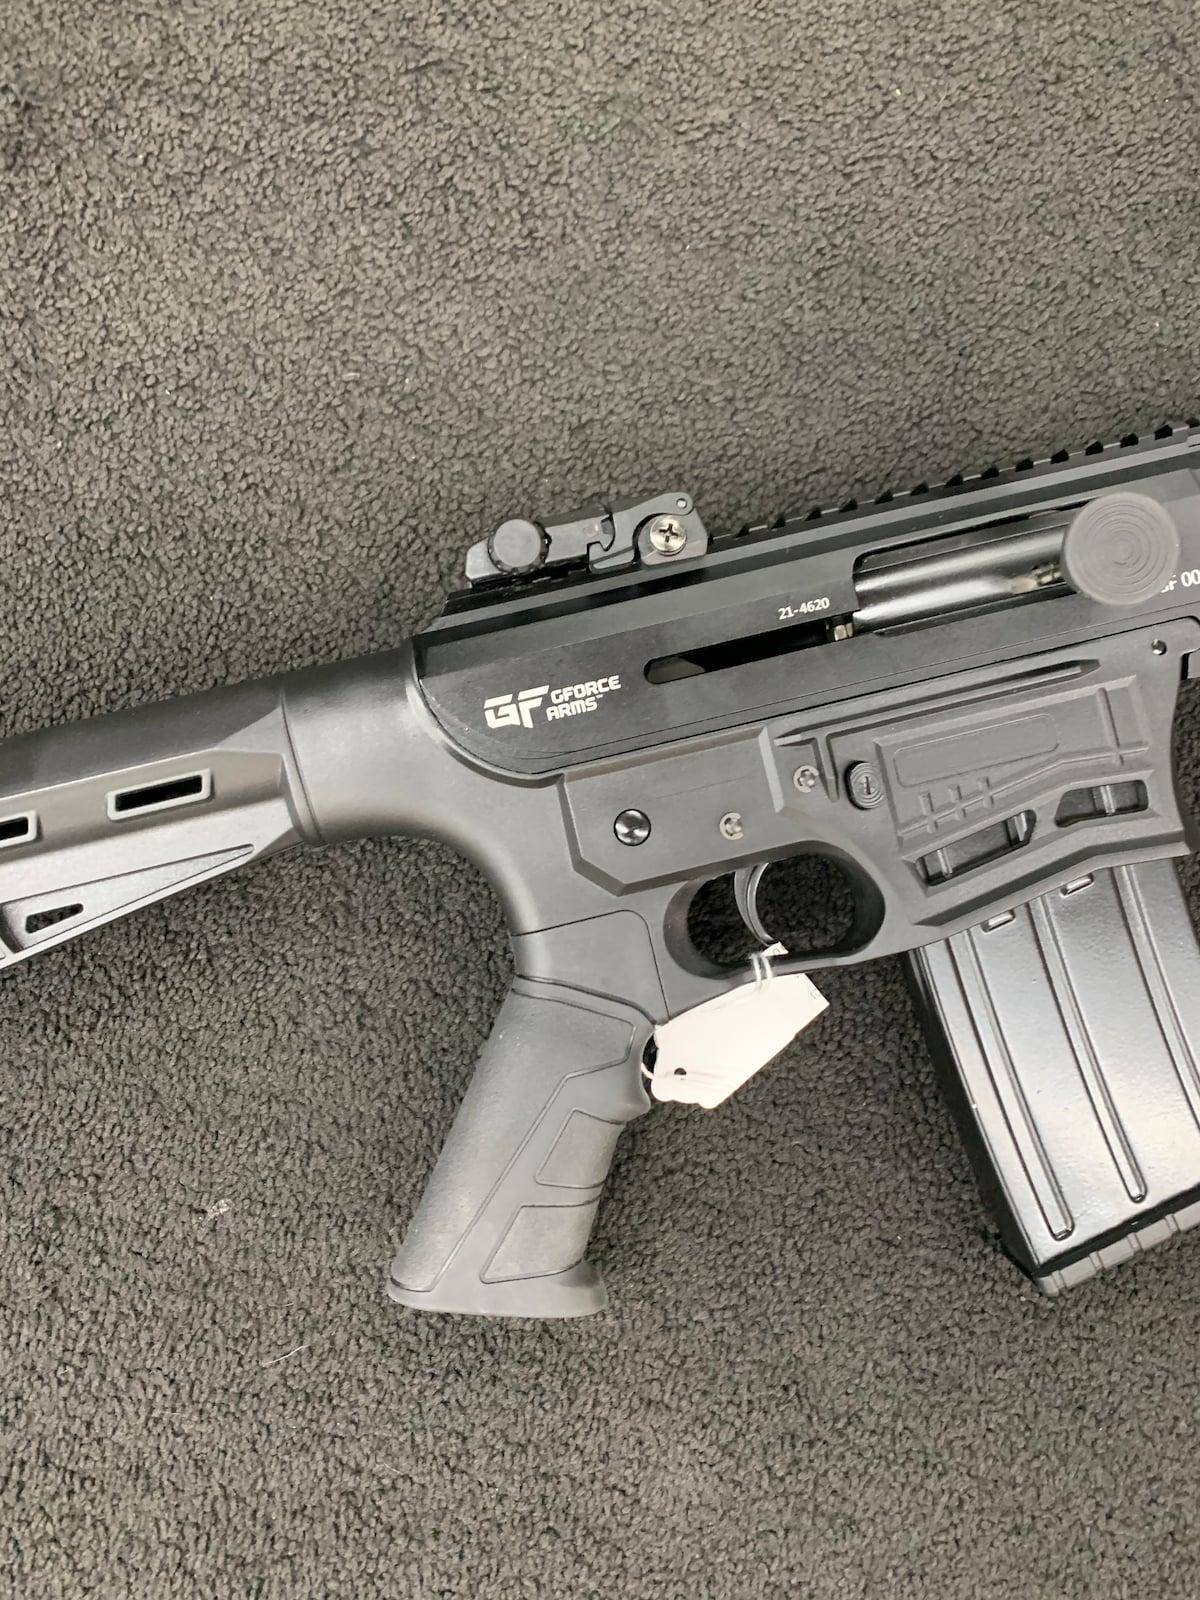 Radikal Arms GF 00s